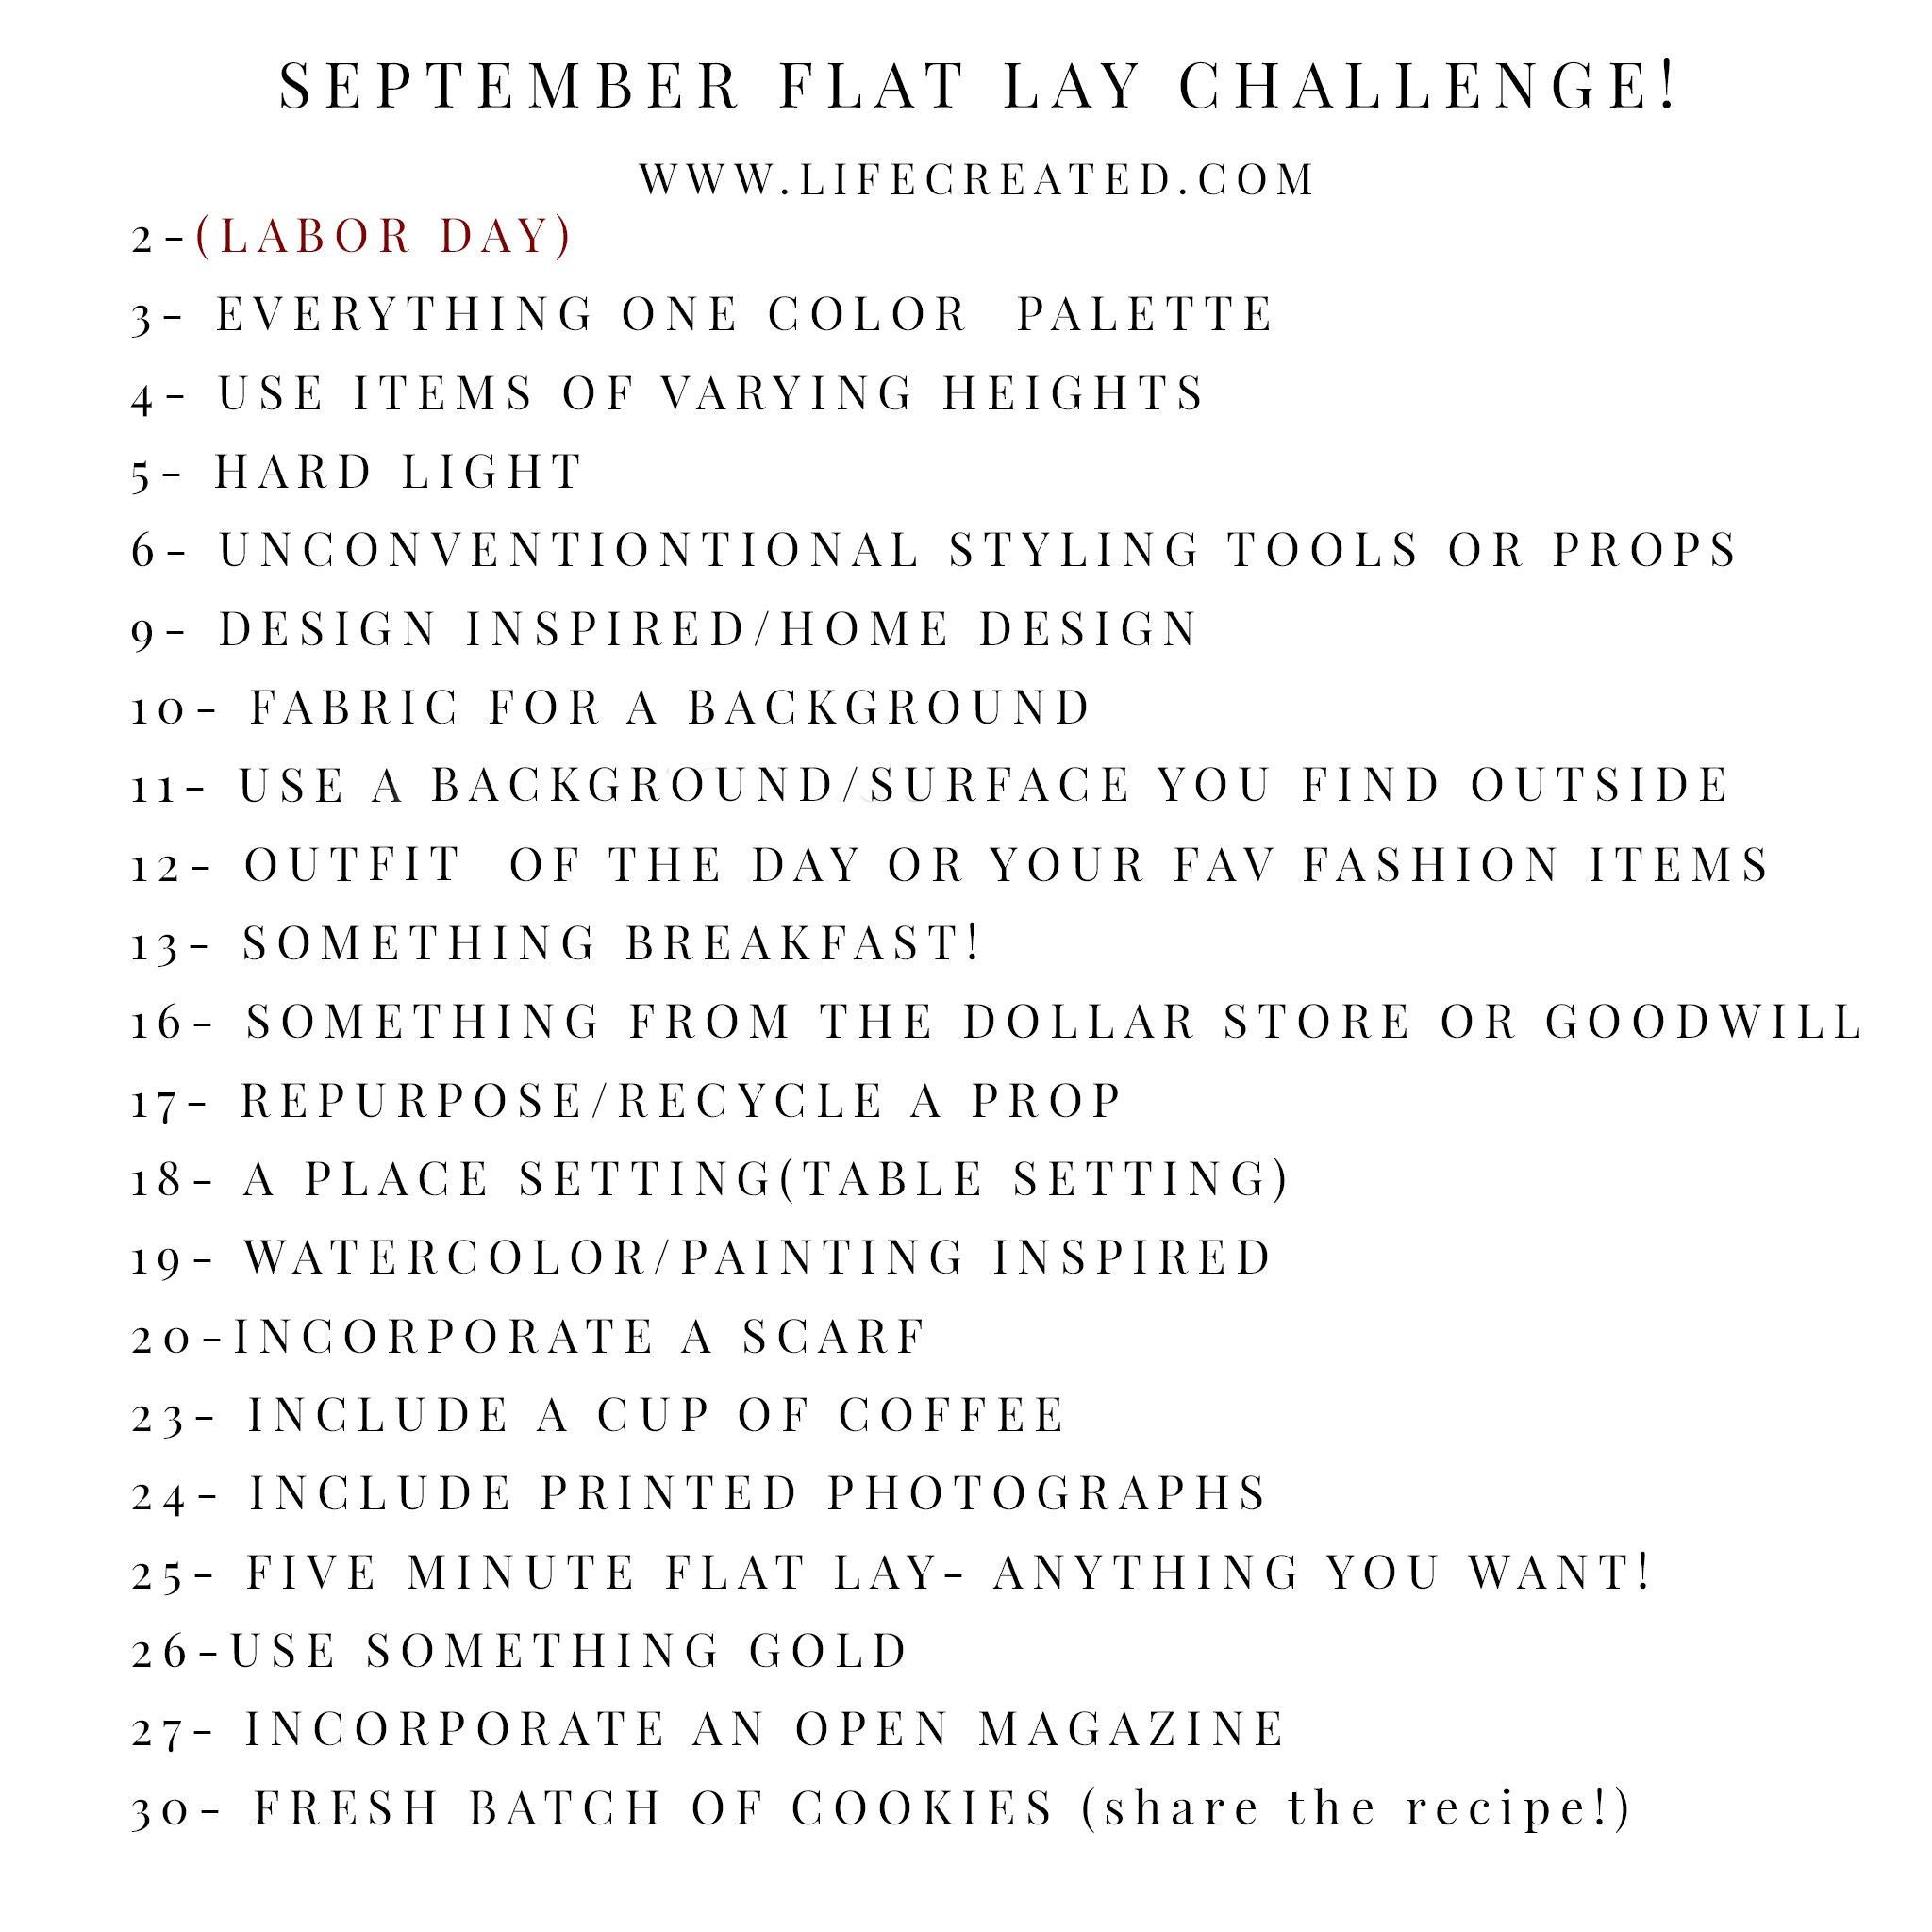 FLAT LAY CHALLENGE